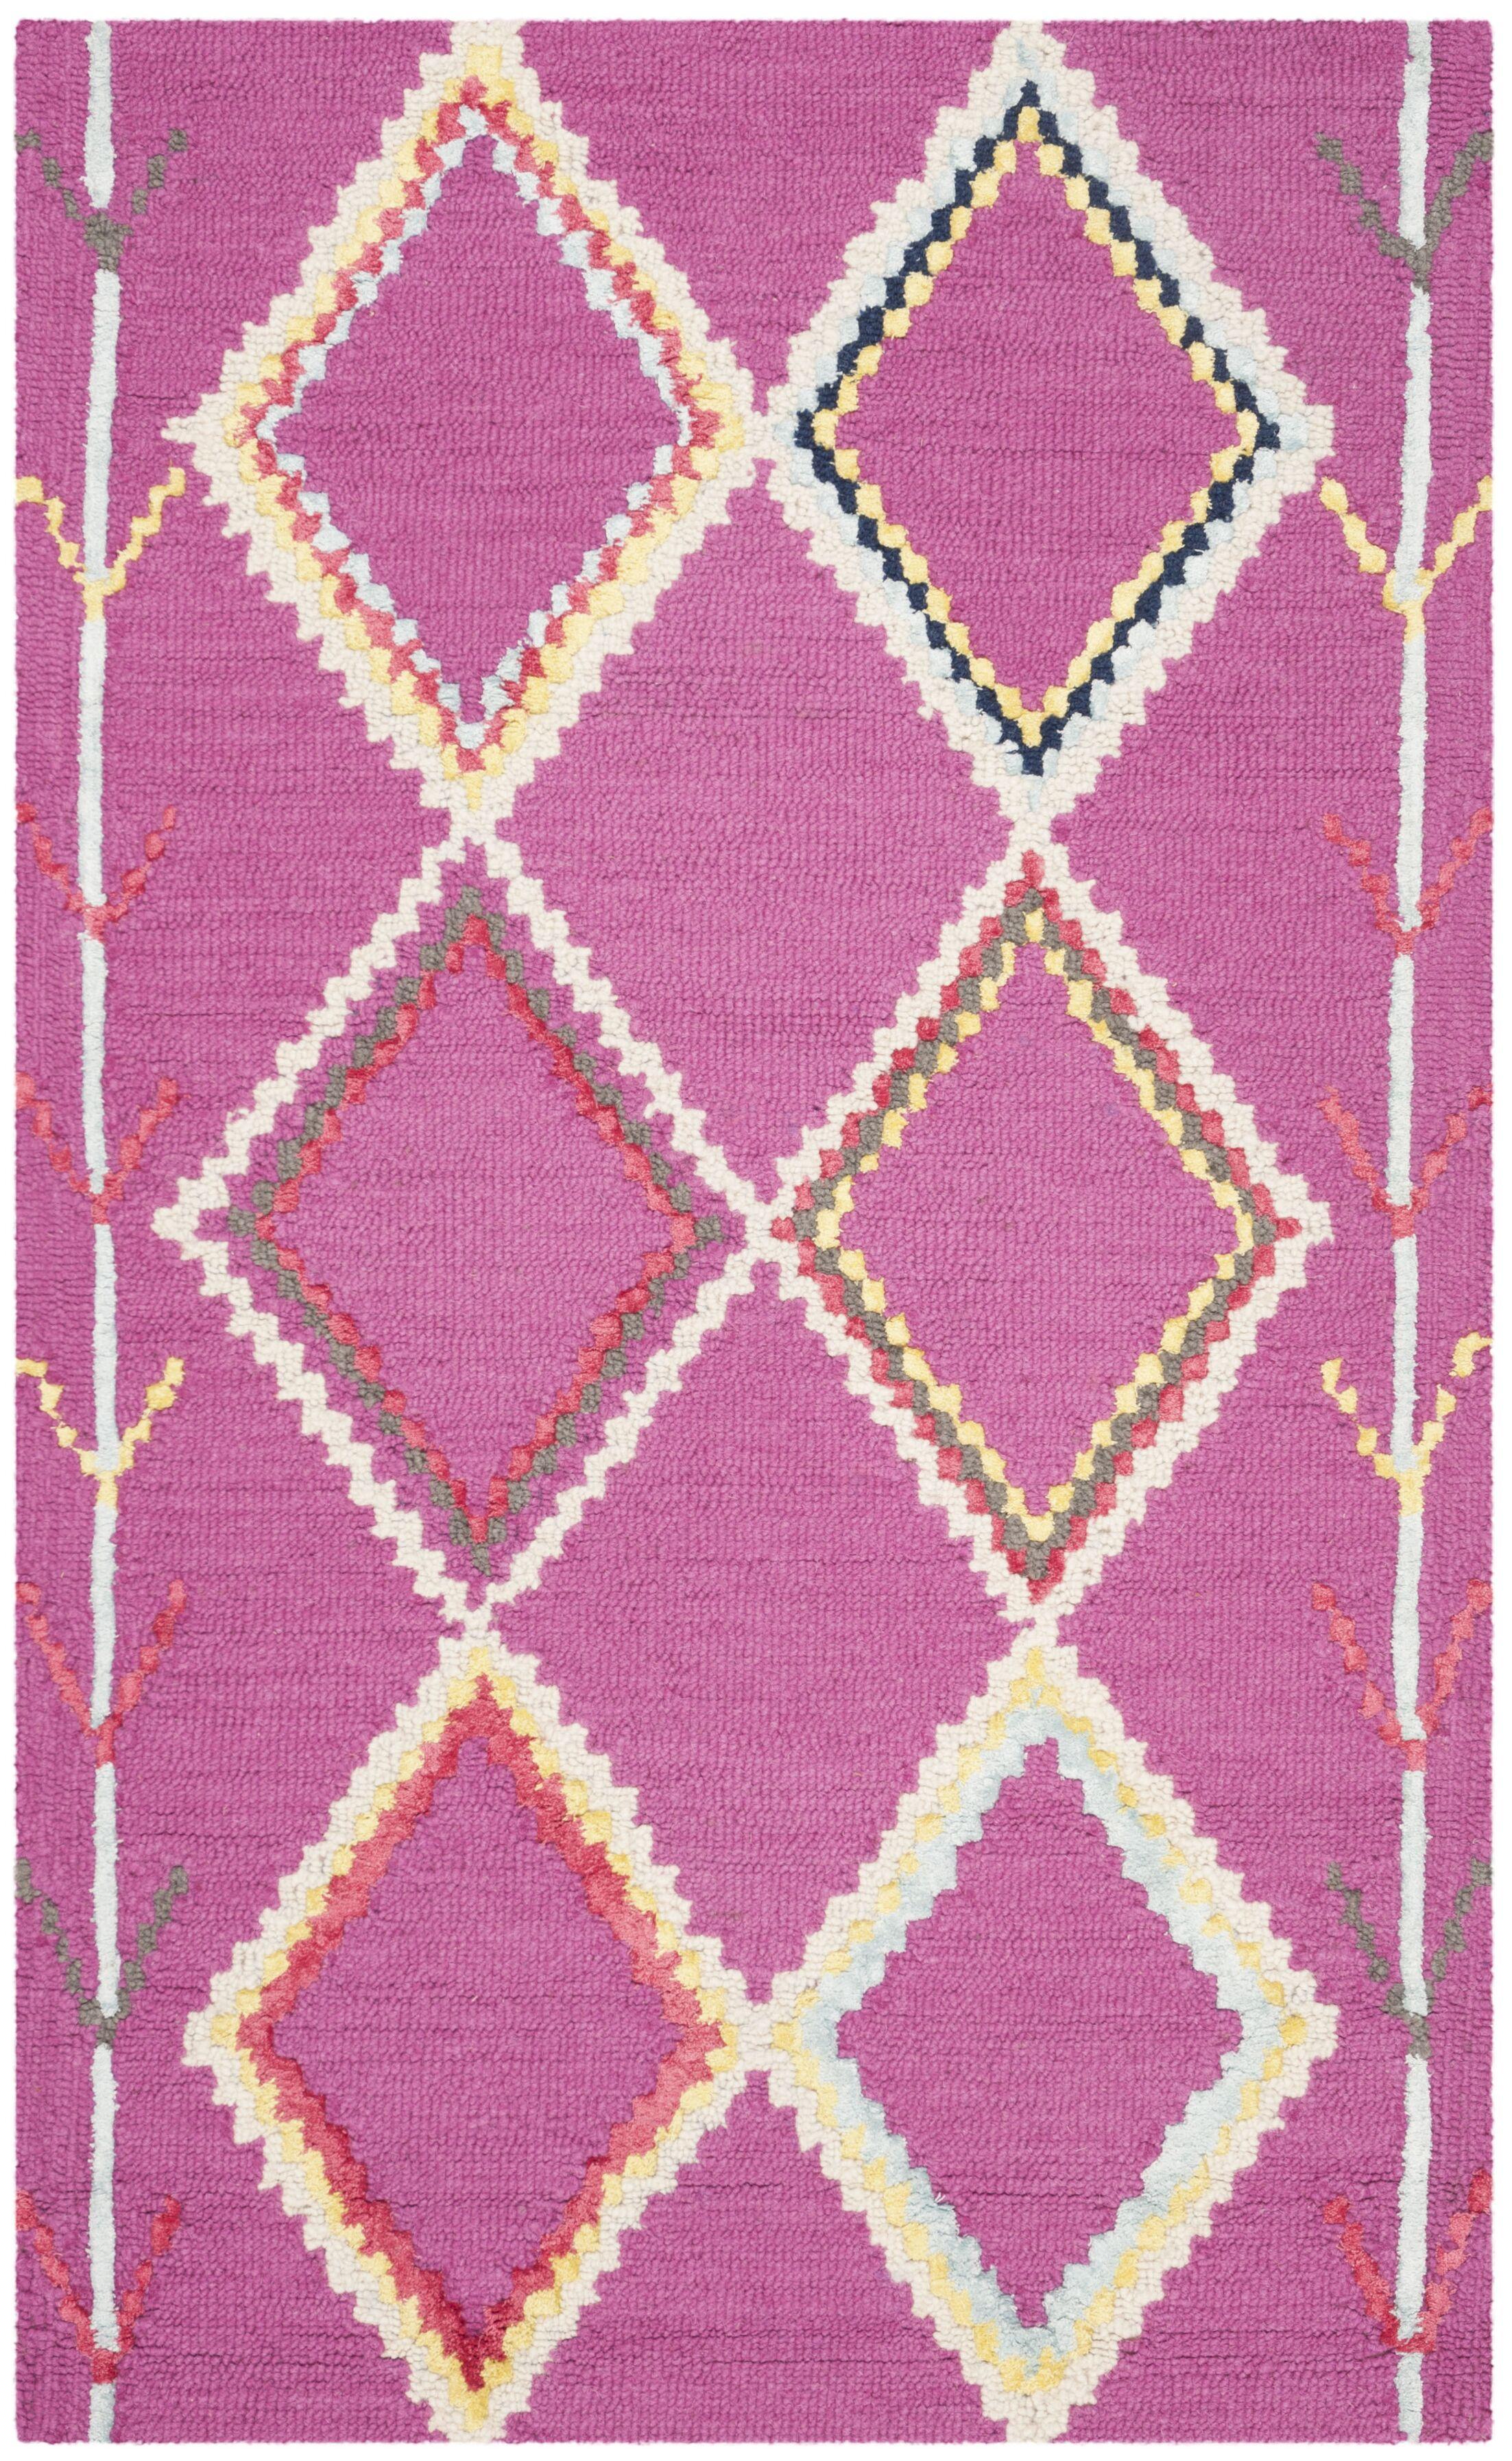 Carolwood Hand Tufted Wool Fuchsia Area Rug Rug Size: Rectangle 3' x 5'